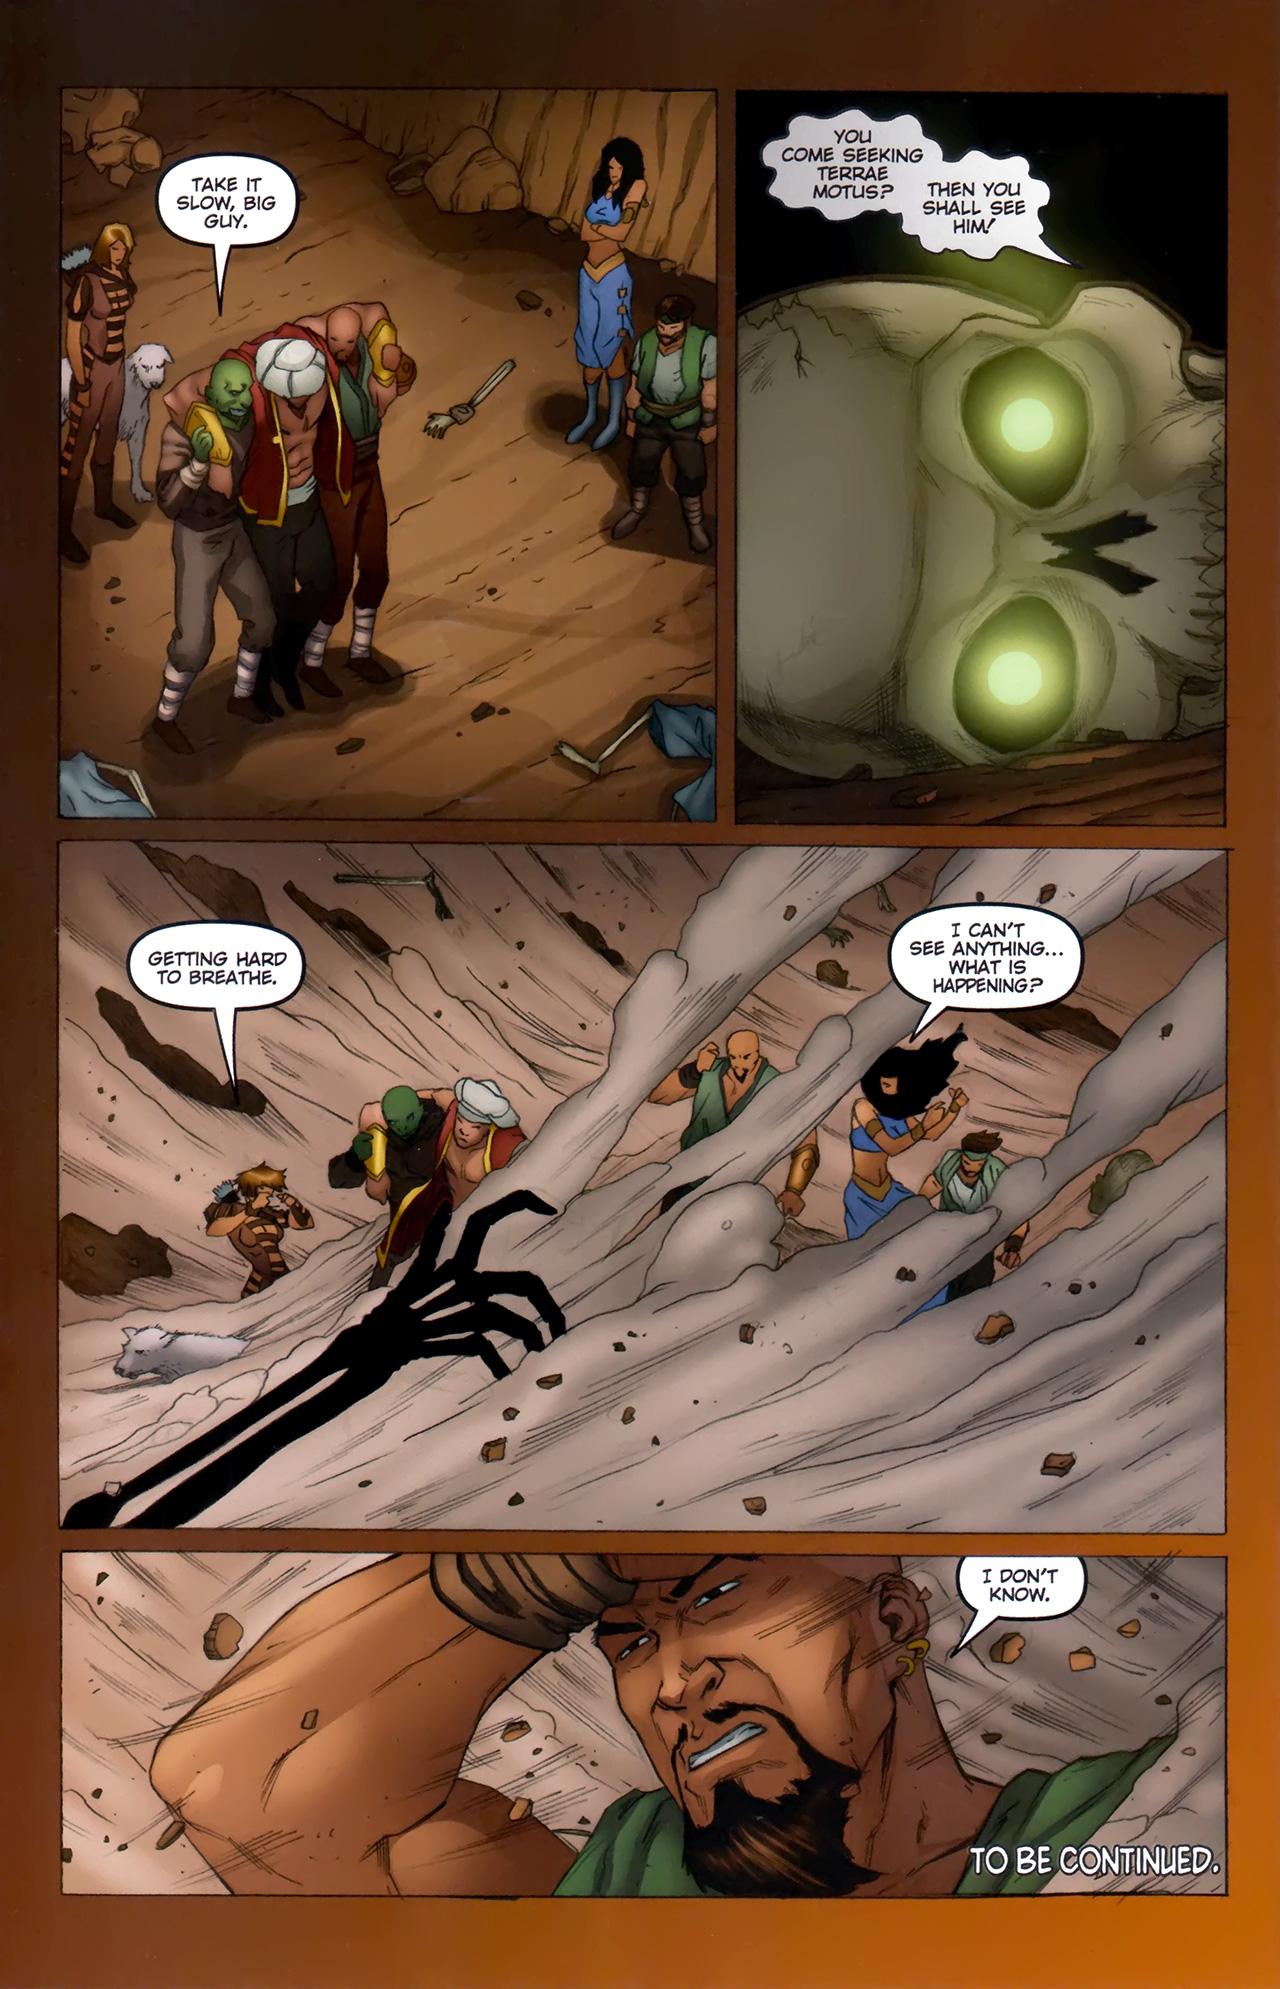 Read online 1001 Arabian Nights: The Adventures of Sinbad comic -  Issue #11 - 24